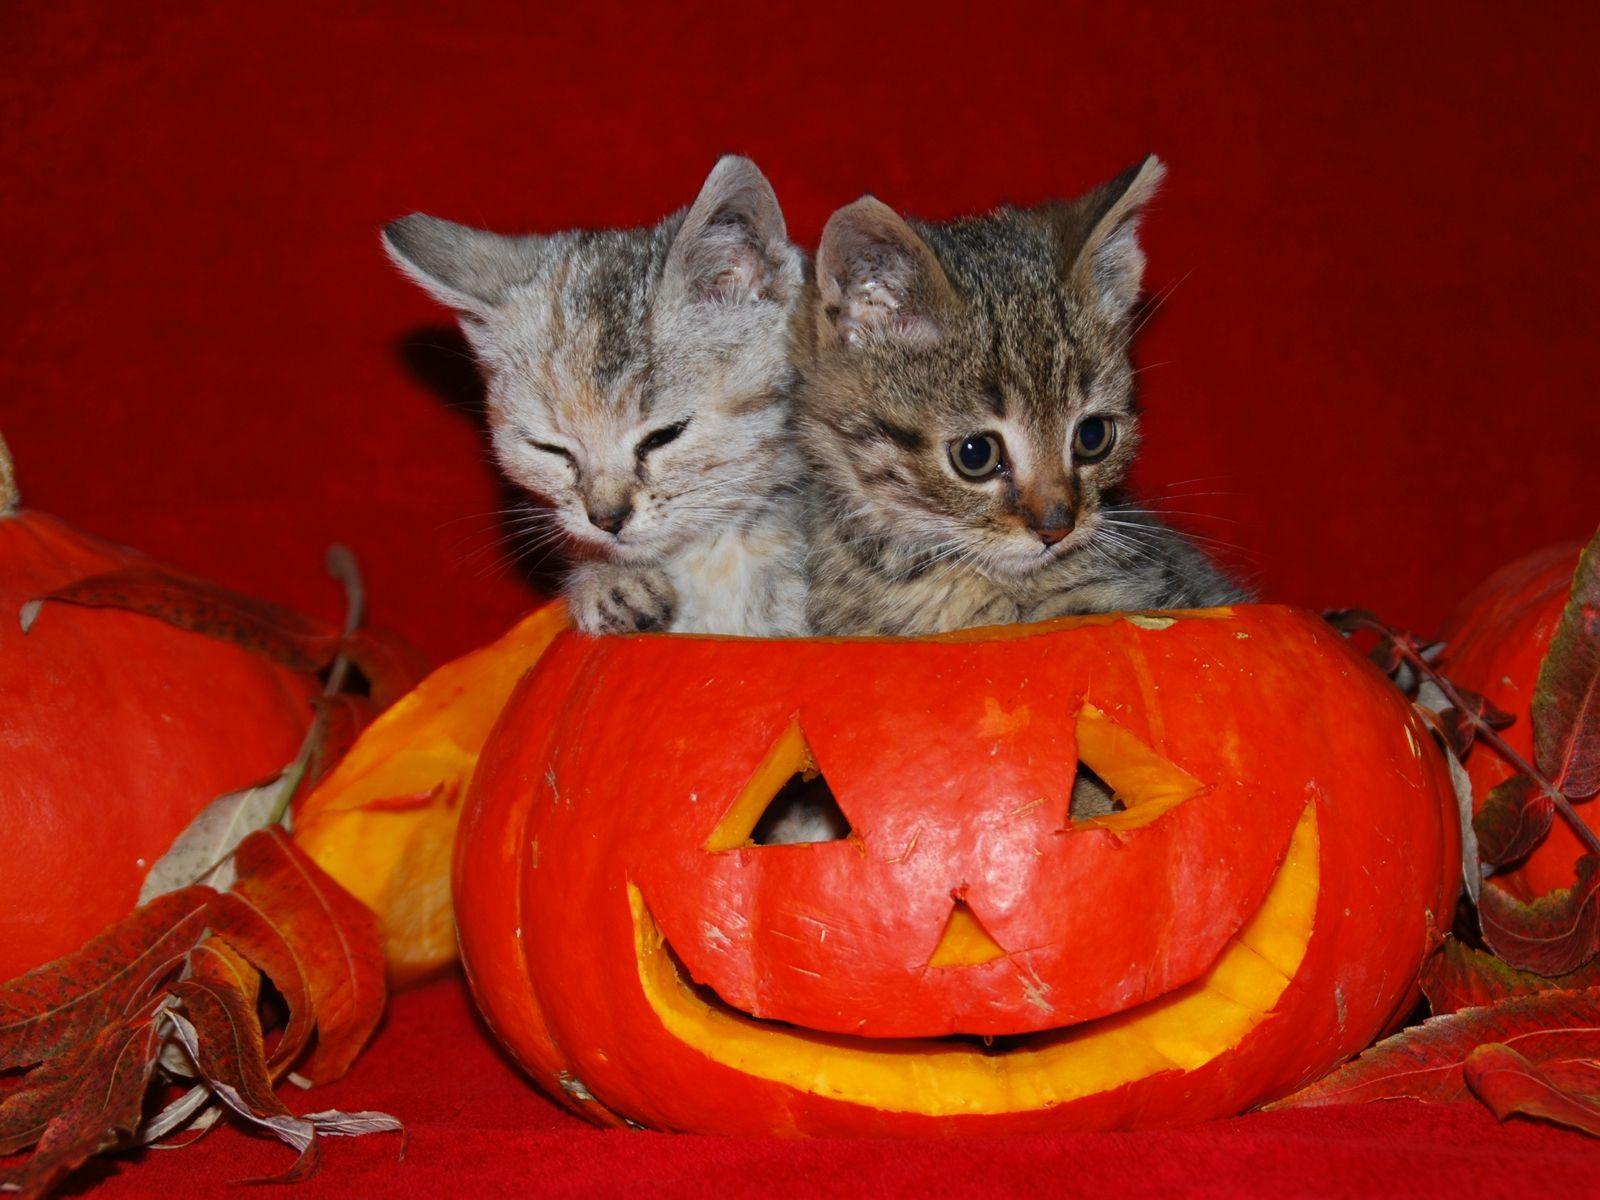 1920x1080 download wallpaper x animals cat lies look full hd. Halloween Cat Wallpapers Top Free Halloween Cat Backgrounds Wallpaperaccess